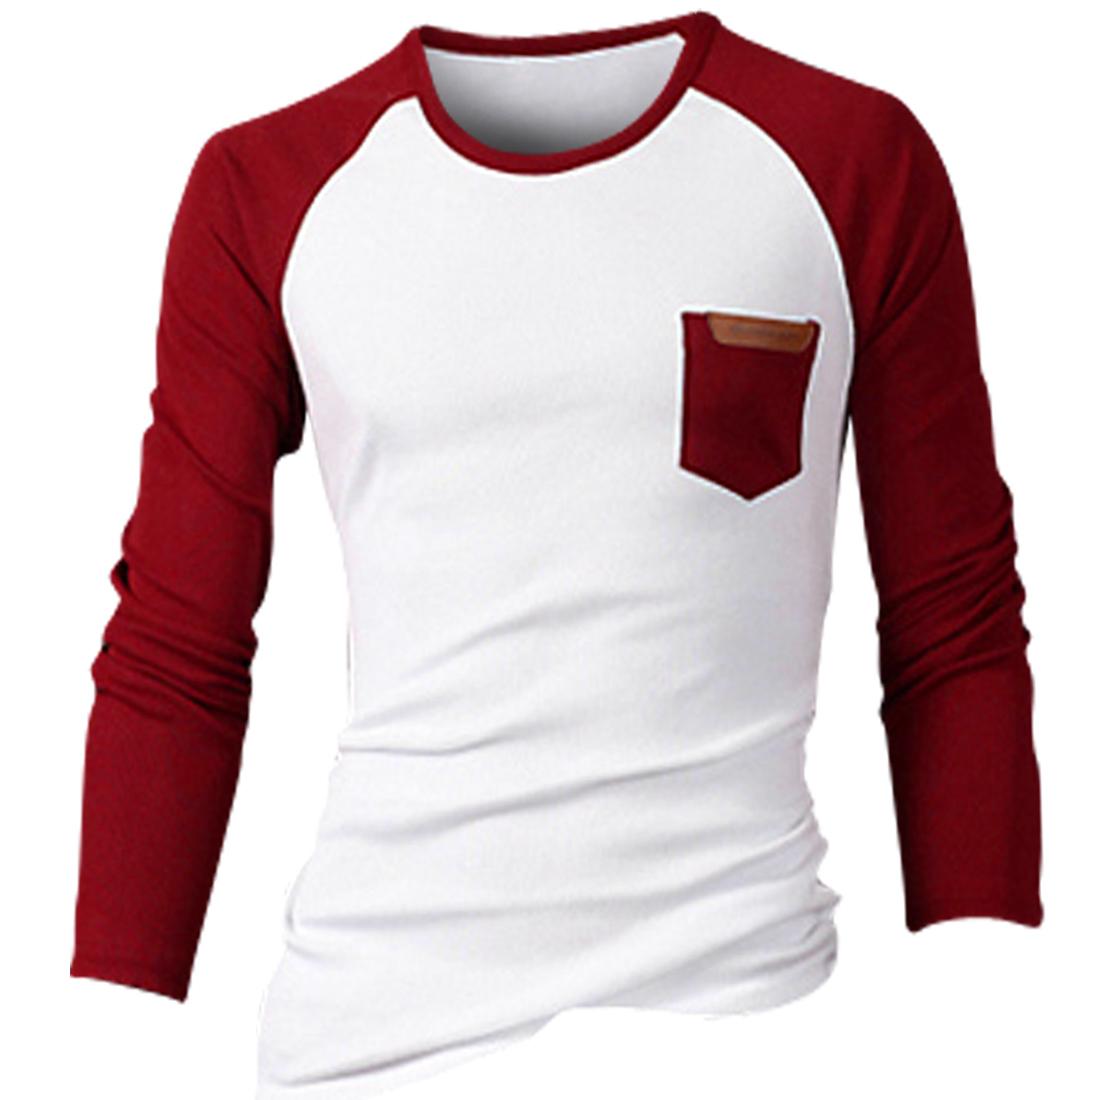 Men Pullover Round Neck Chest Pocket Design Elastic T-shirt Red White M